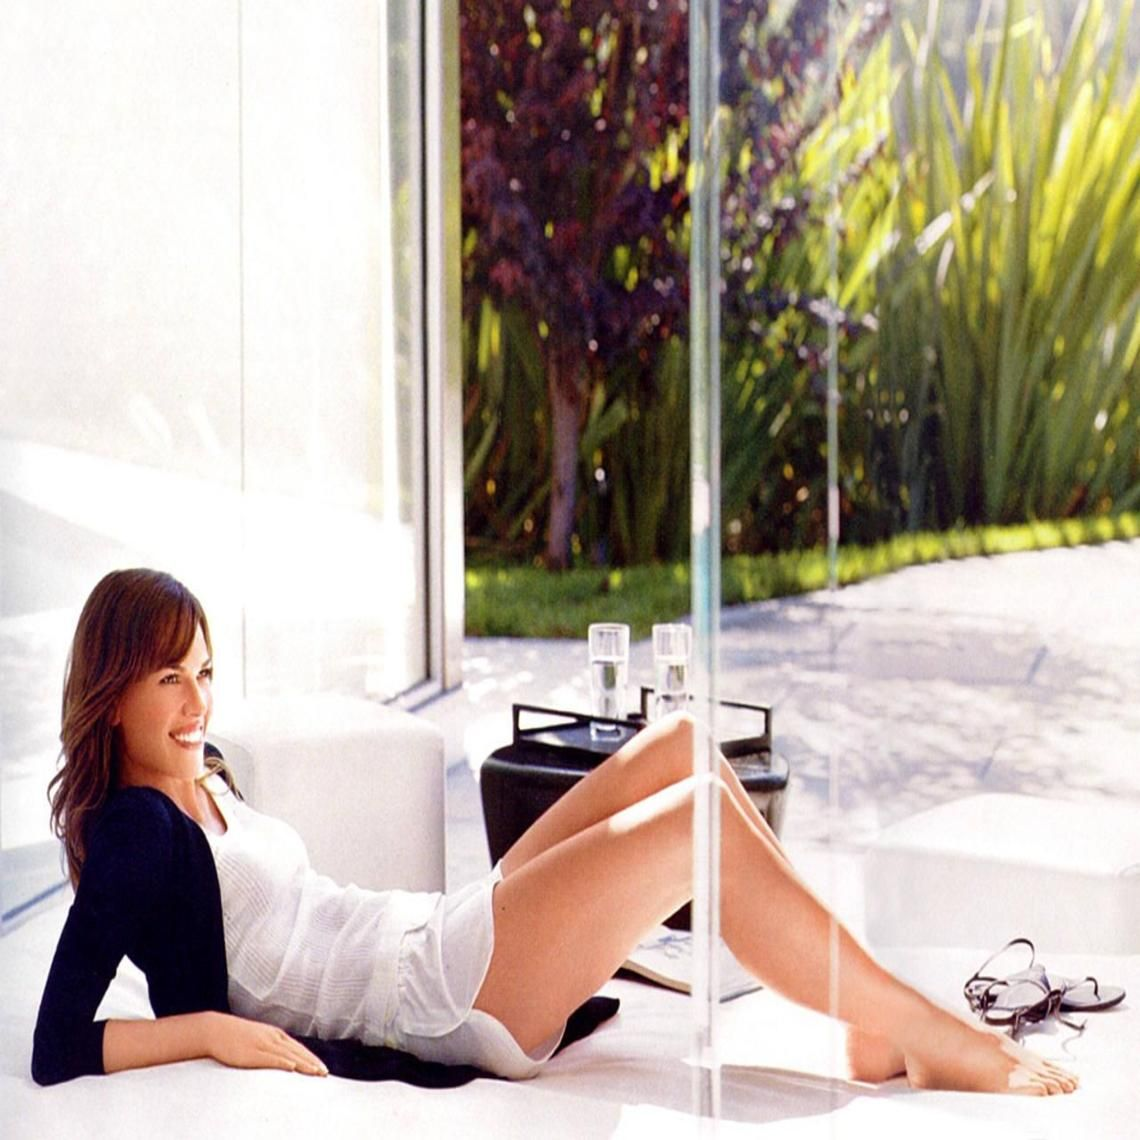 Hilary Swank Swank, Celebrities, Entertainment news